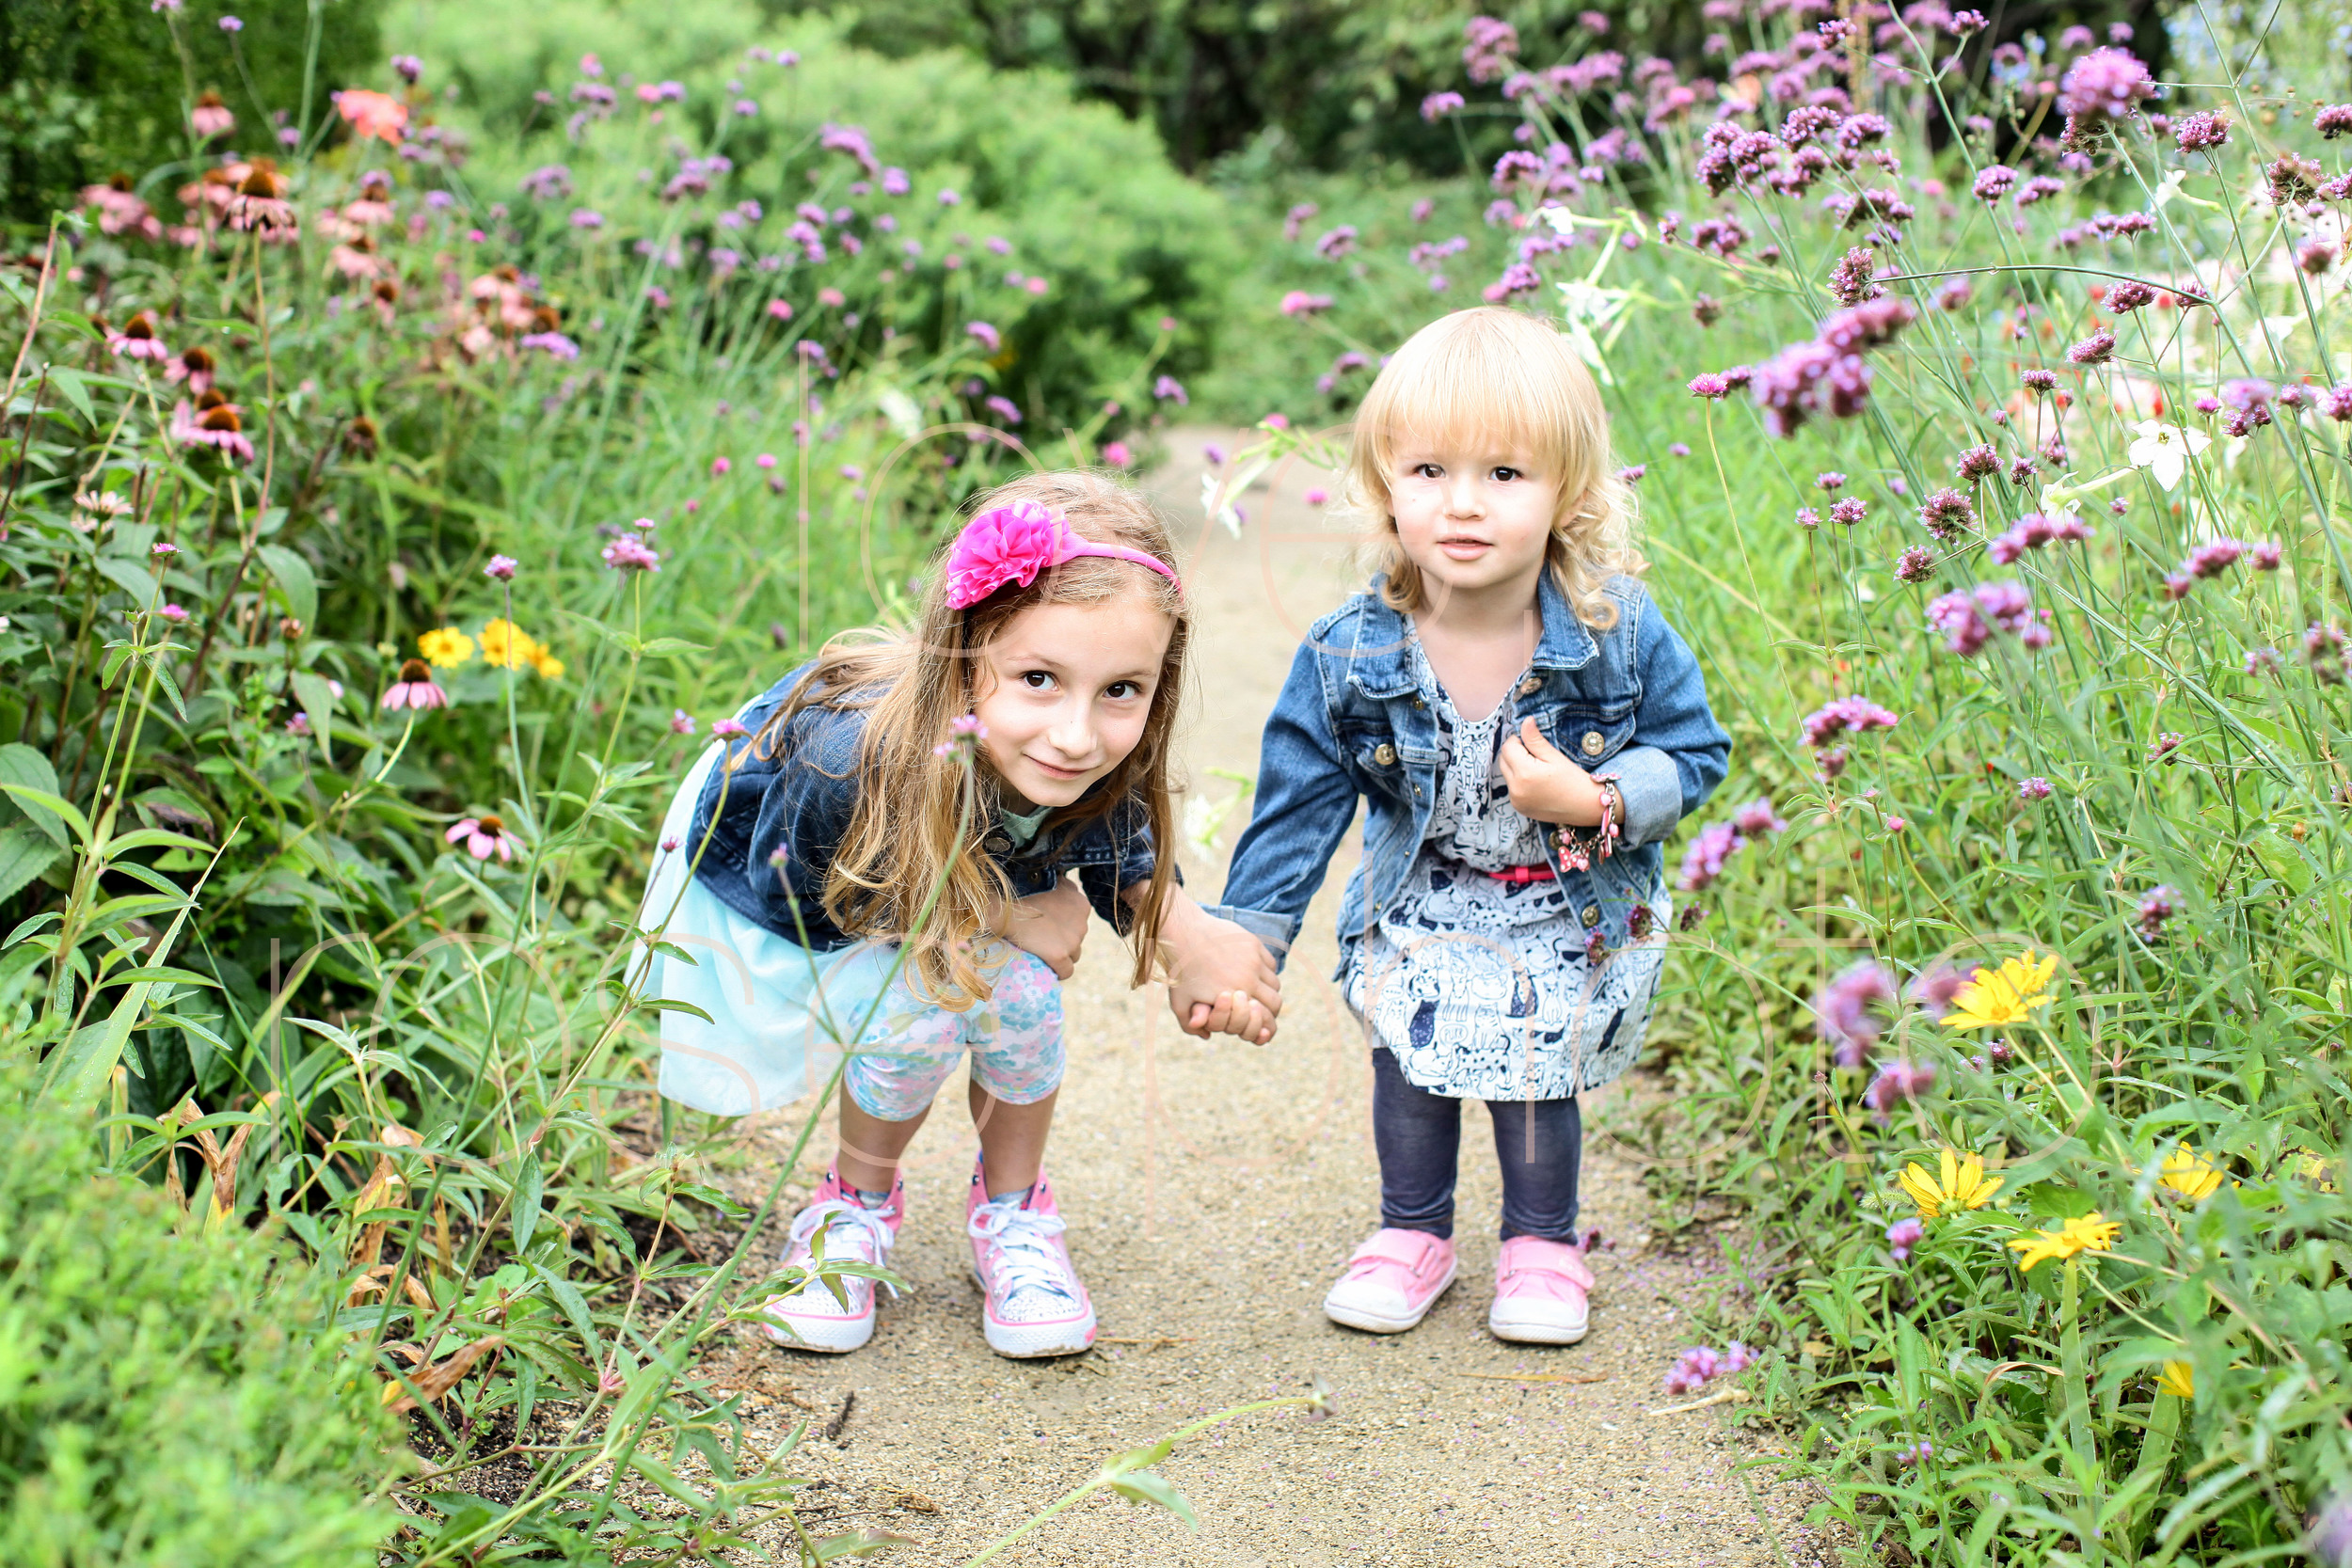 M jedrzejowski Summer 2015 Chicago childrens photographer lifestyle photography kids photos -001-004.jpg